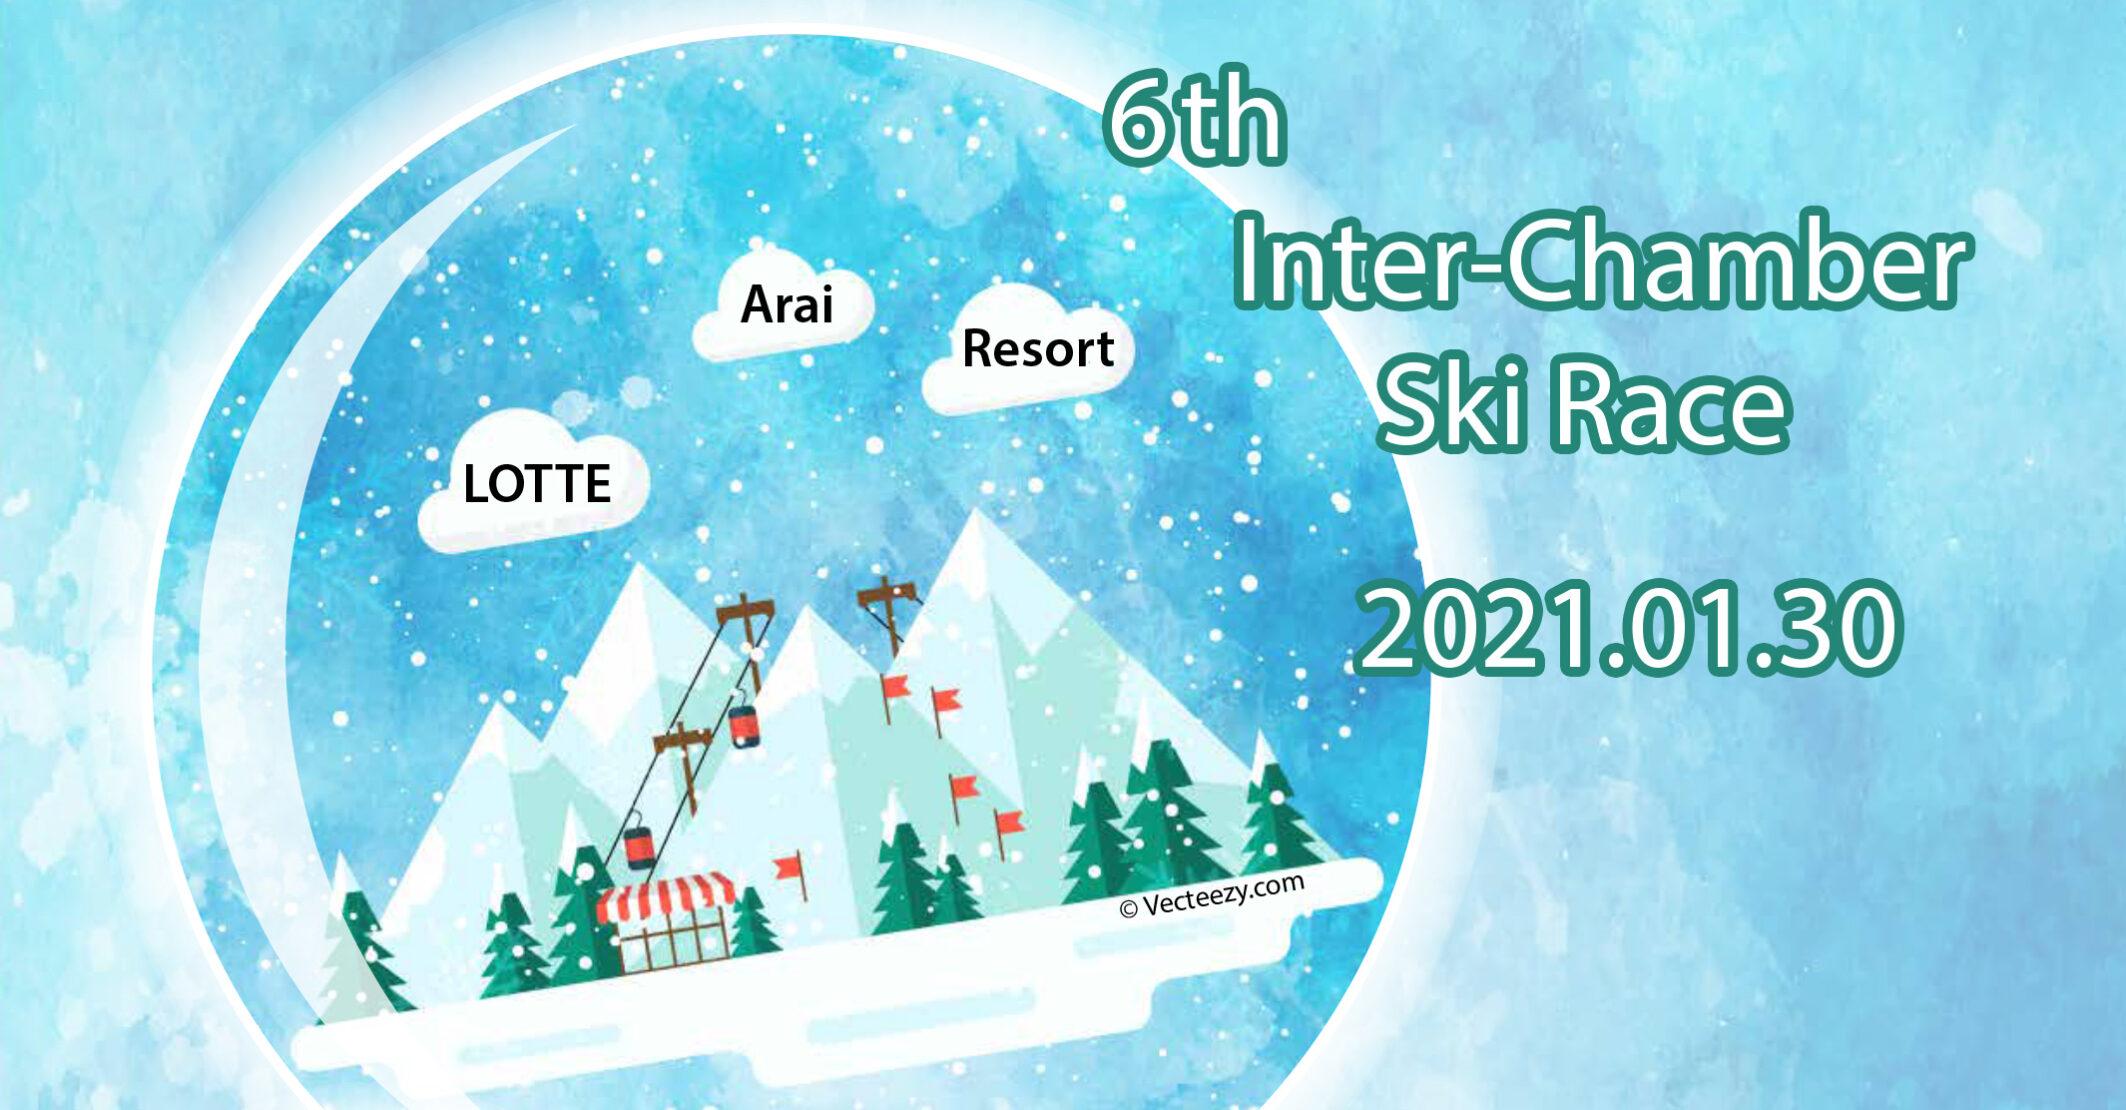 6th Inter-Chamber Ski Race